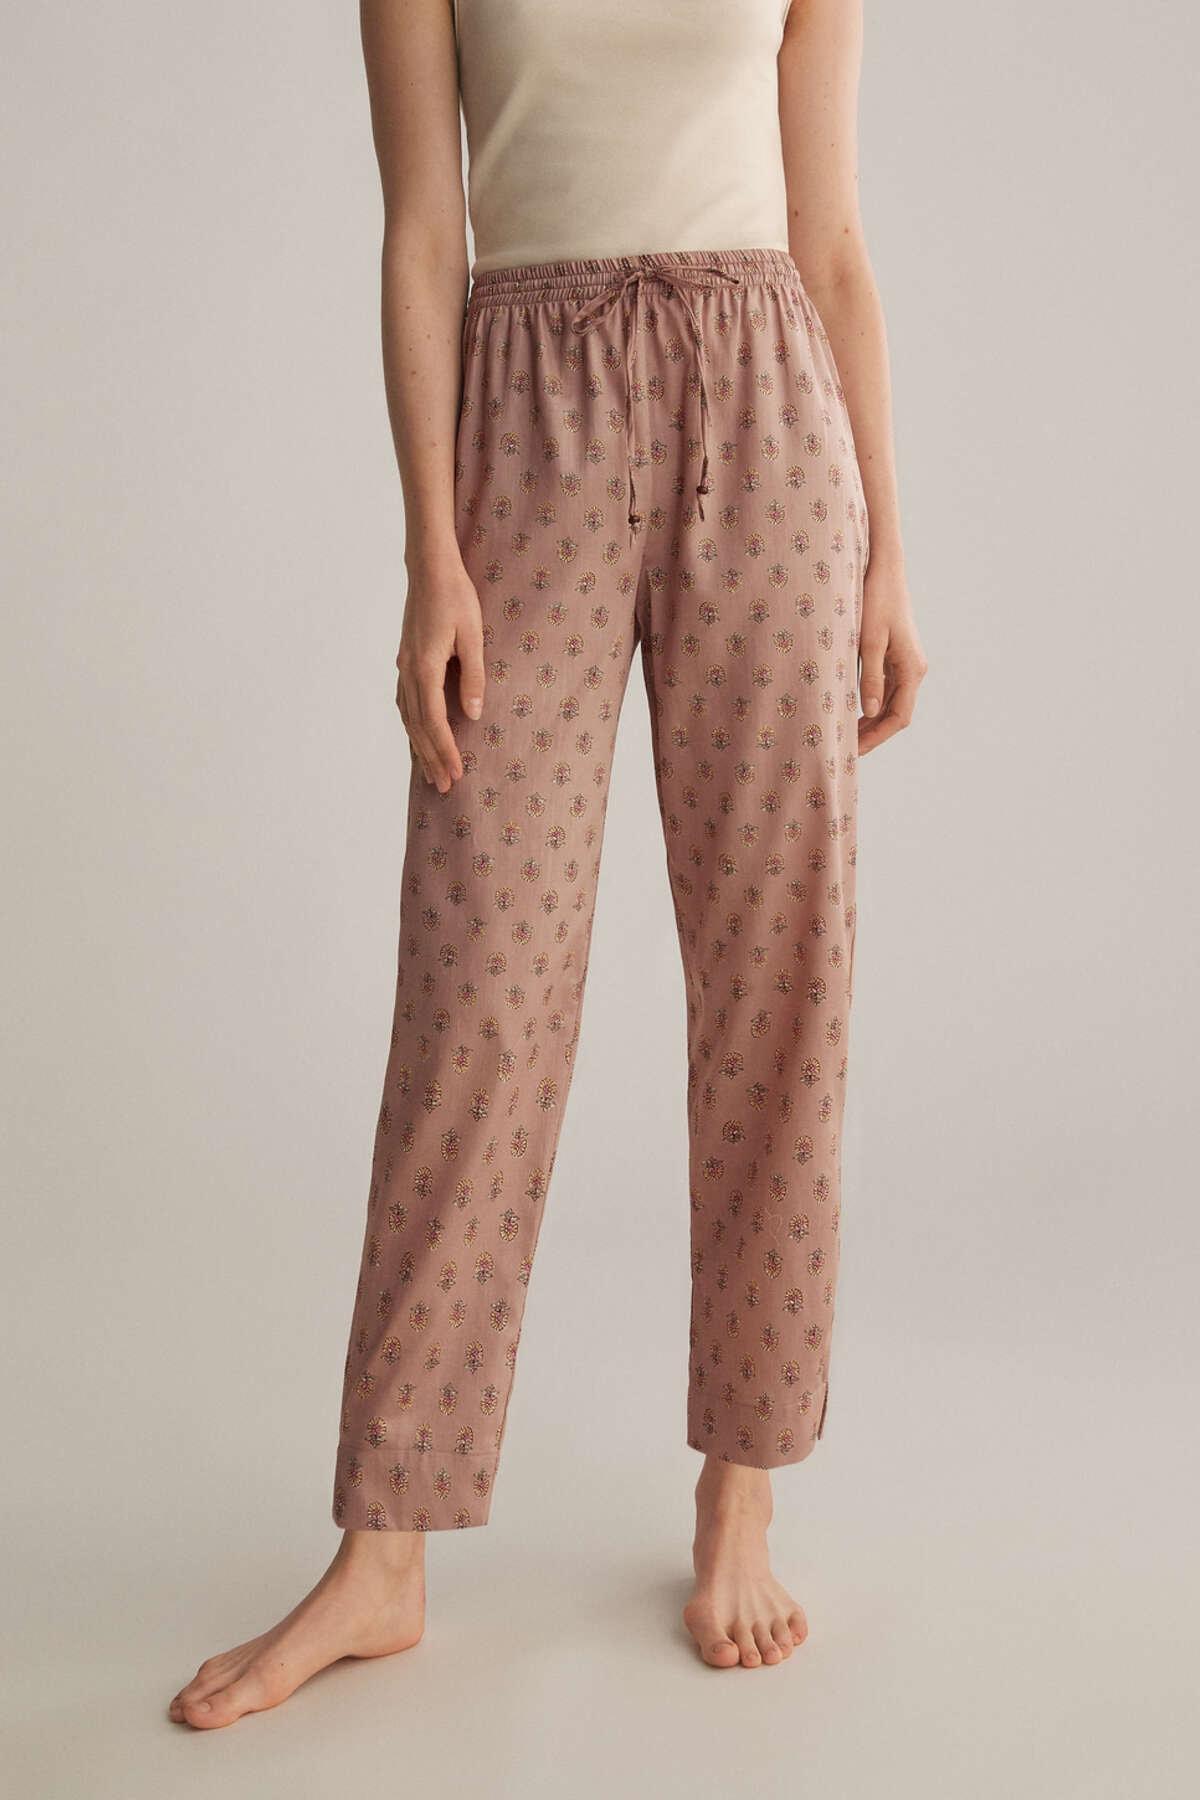 Oysho Kadın Pembe %100 Pamuklu Pul Desenli Pembe Pantolon 30308944